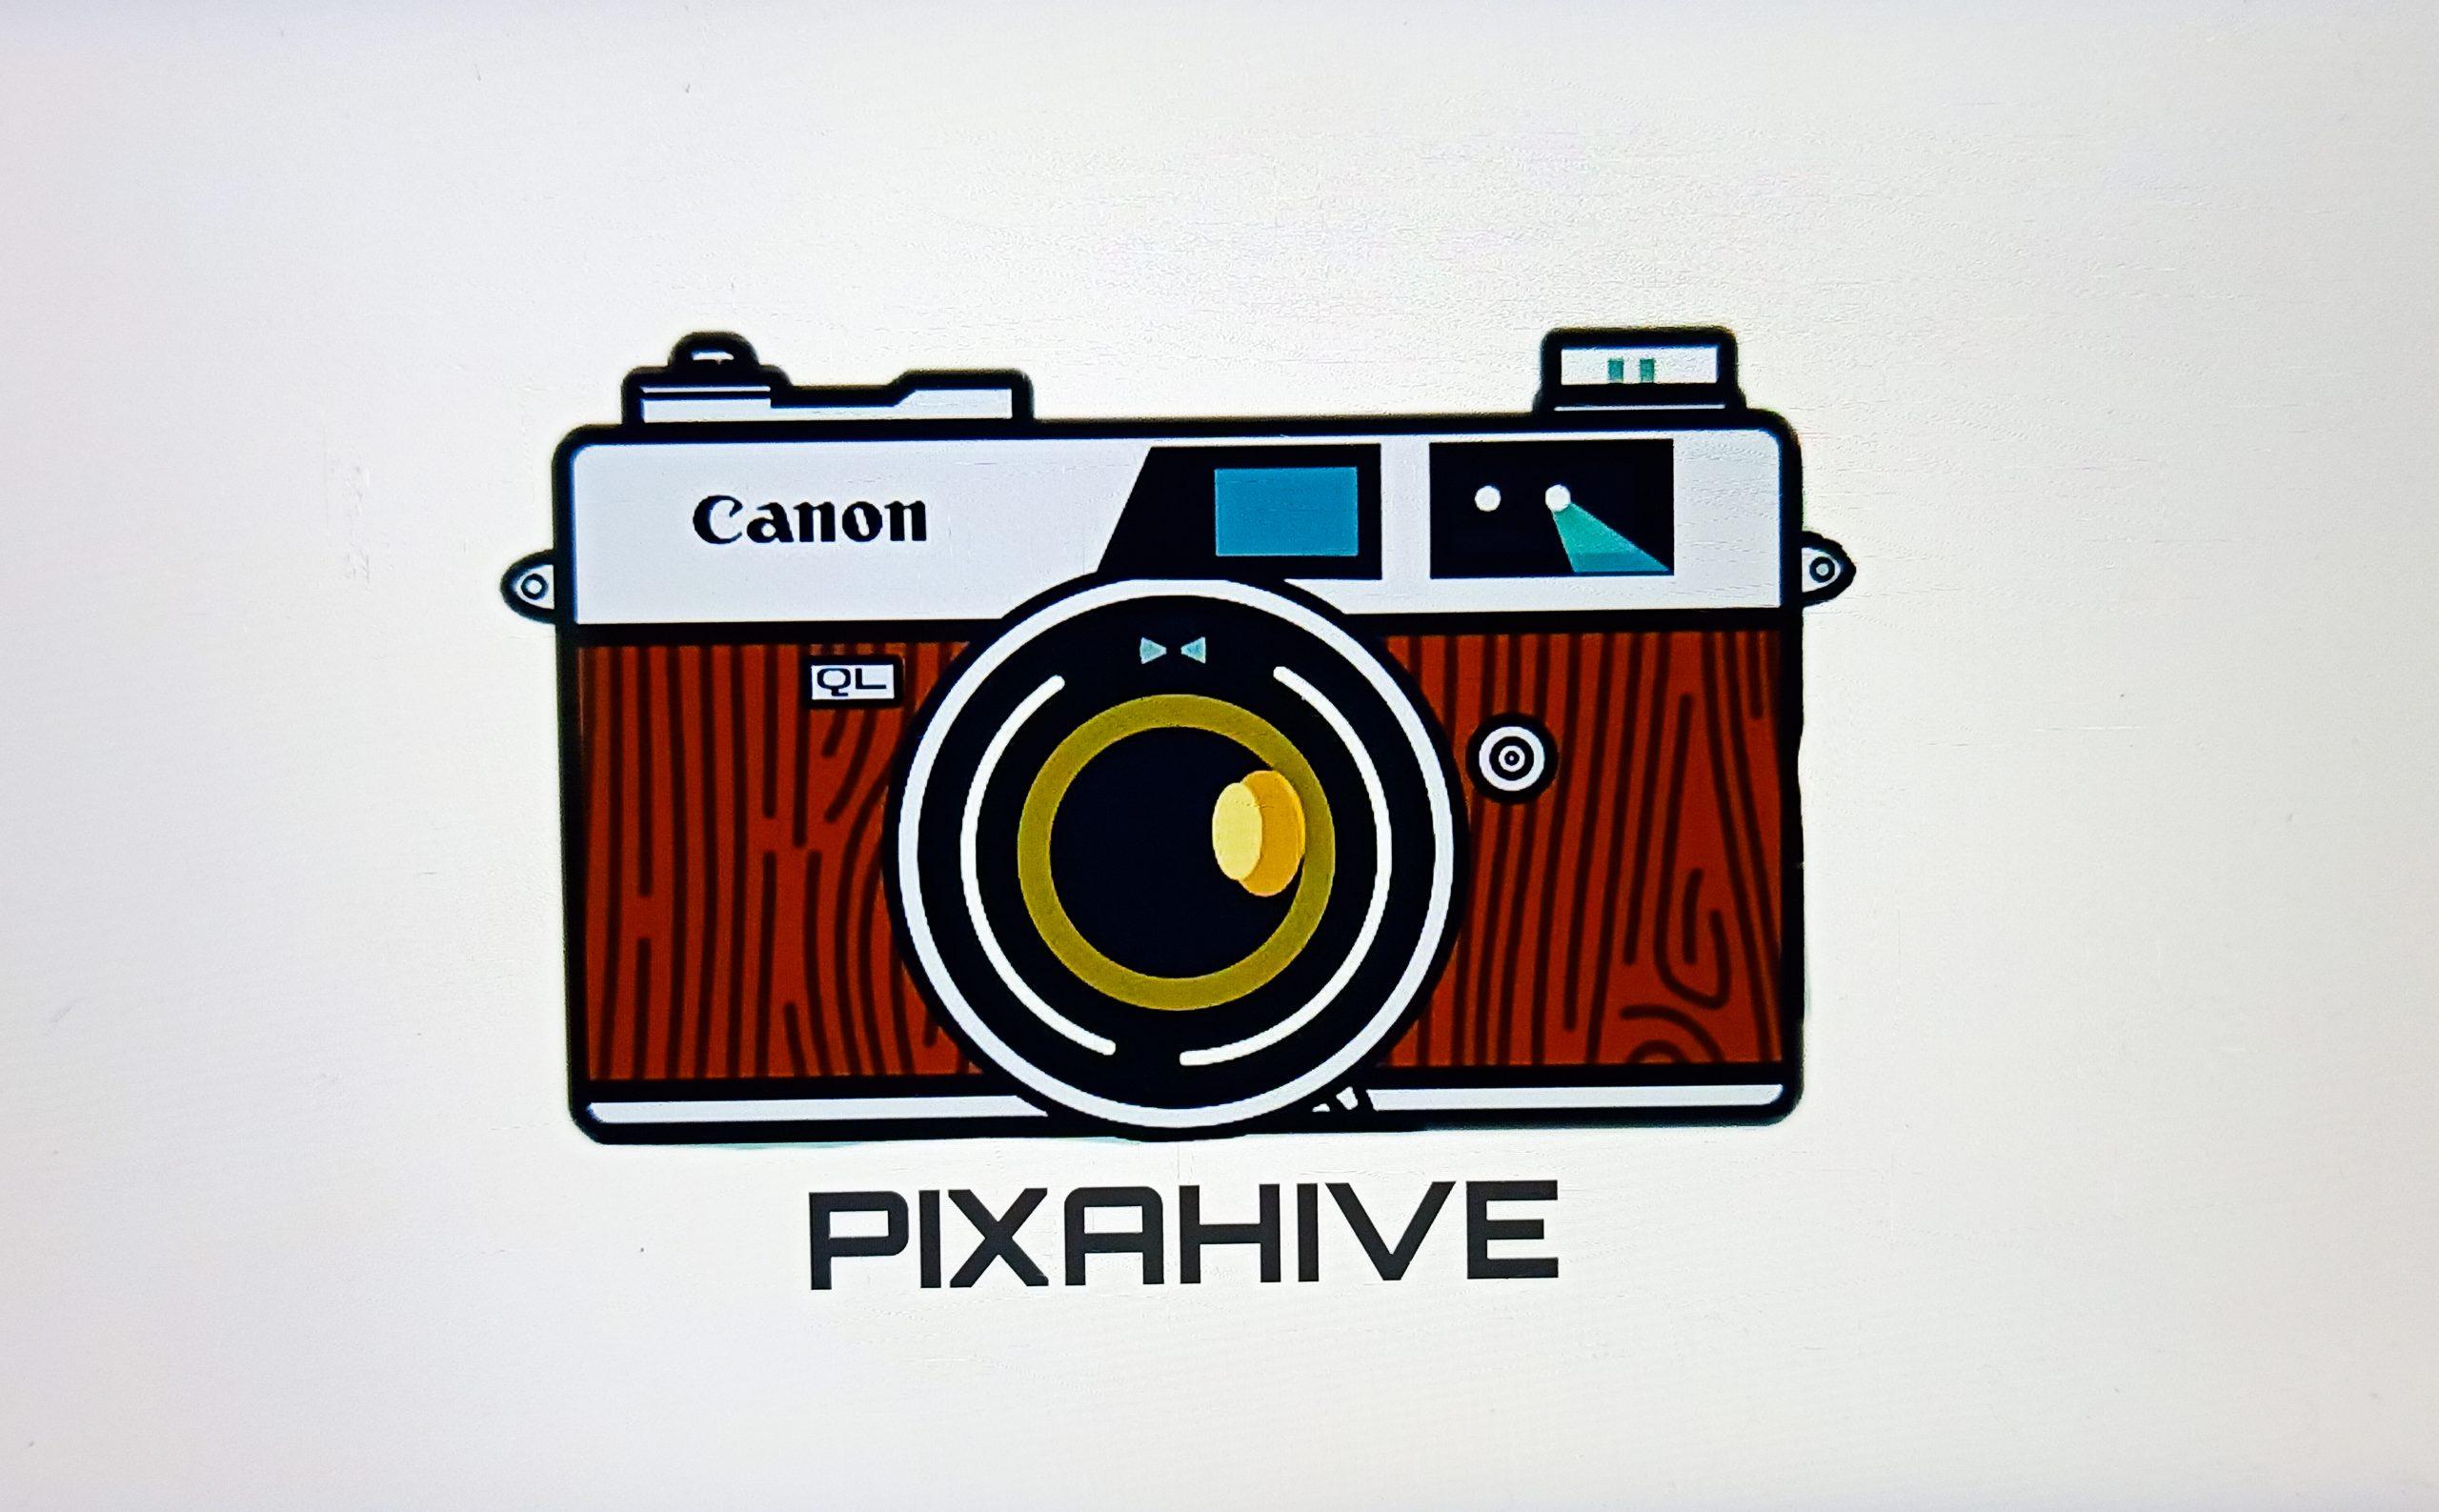 Pixa Hive camera Illustration